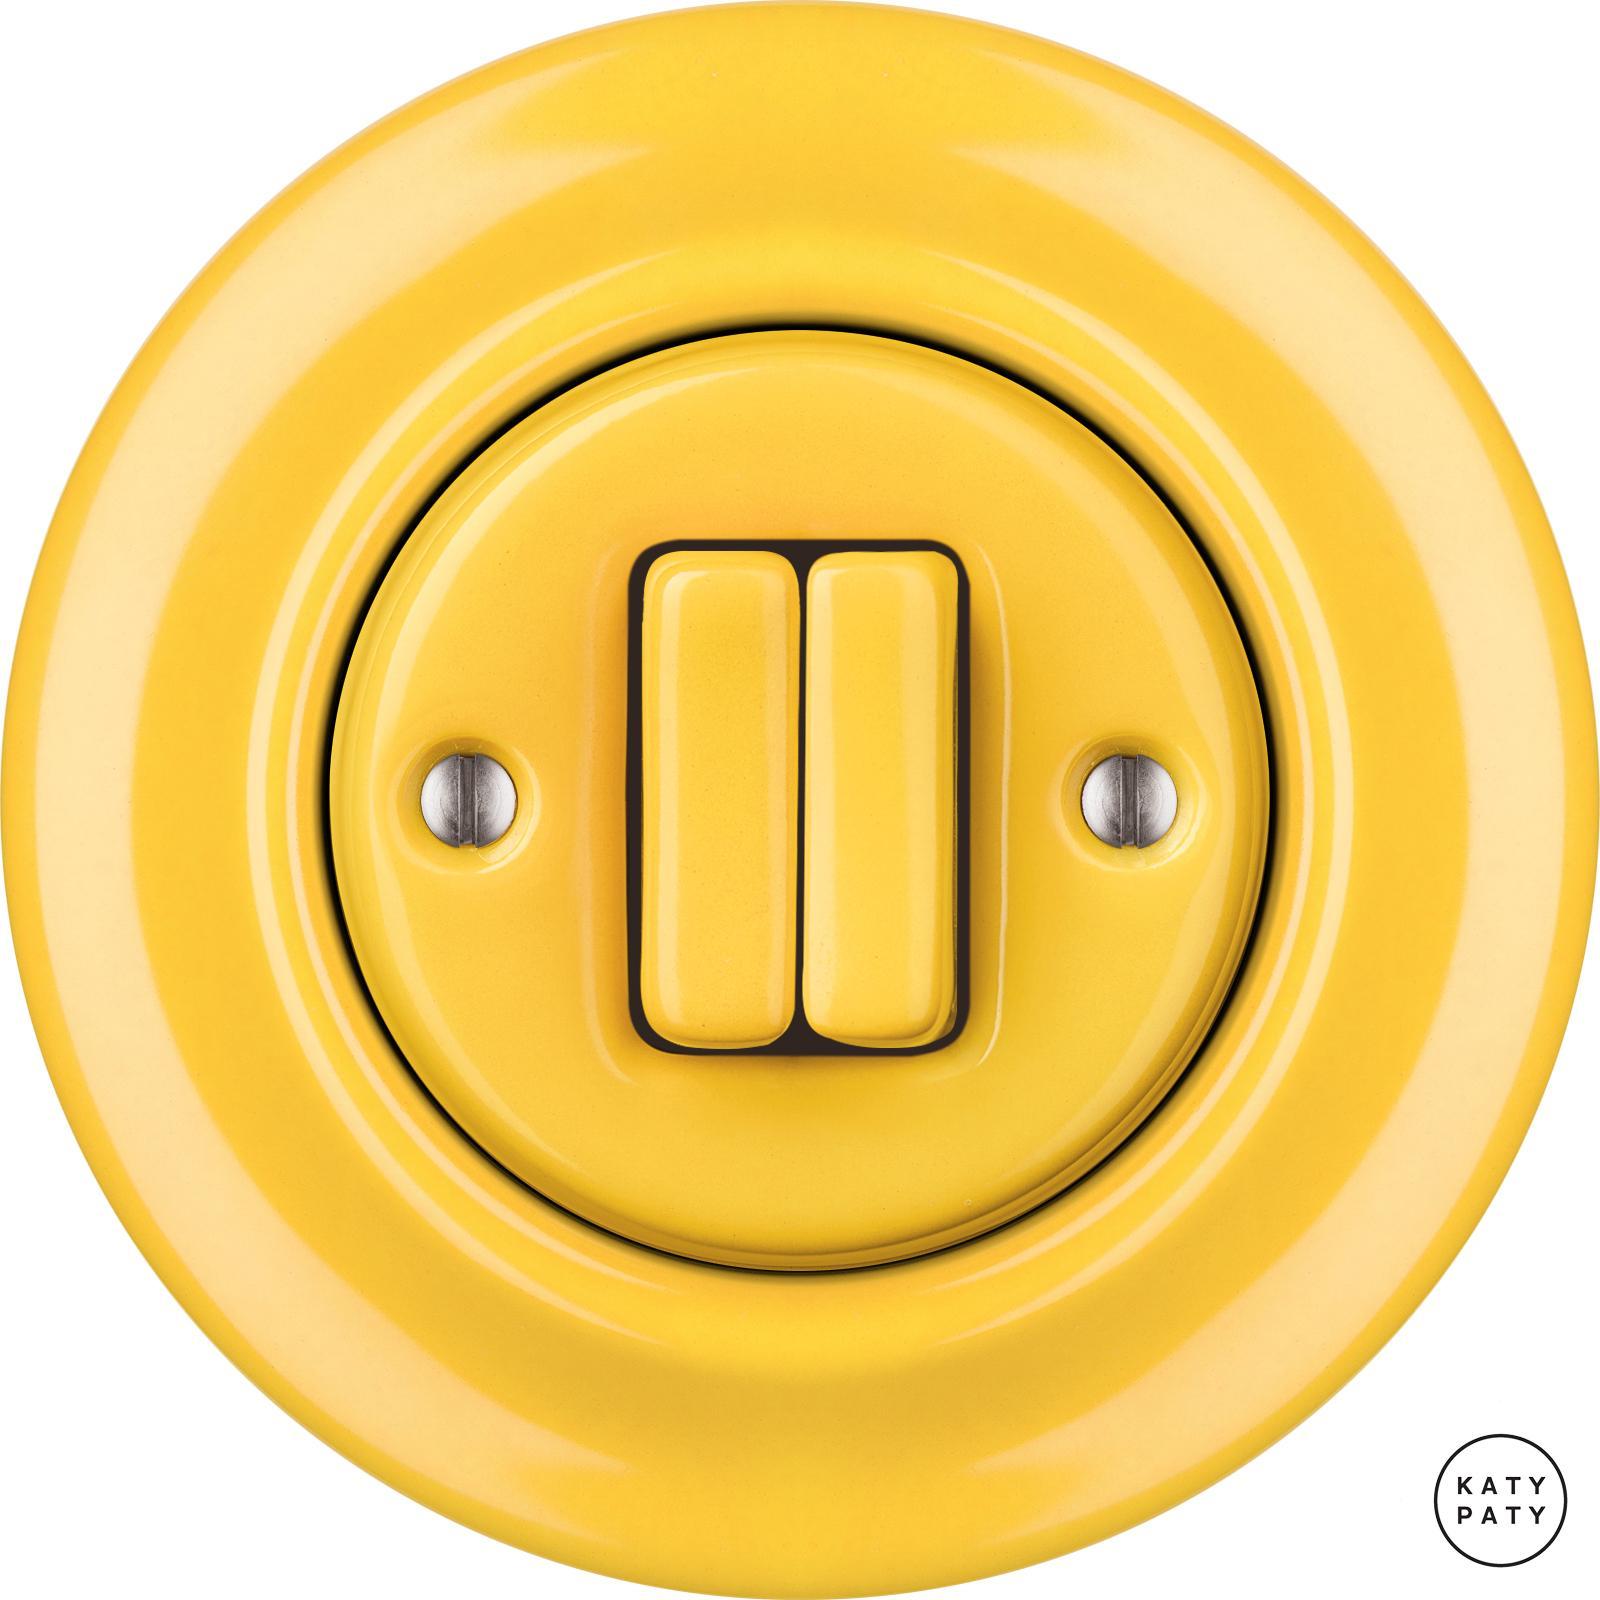 Roo Porzellan Lichtschalter - 2 Tasten - NITOR LUTEA | Katy Paty